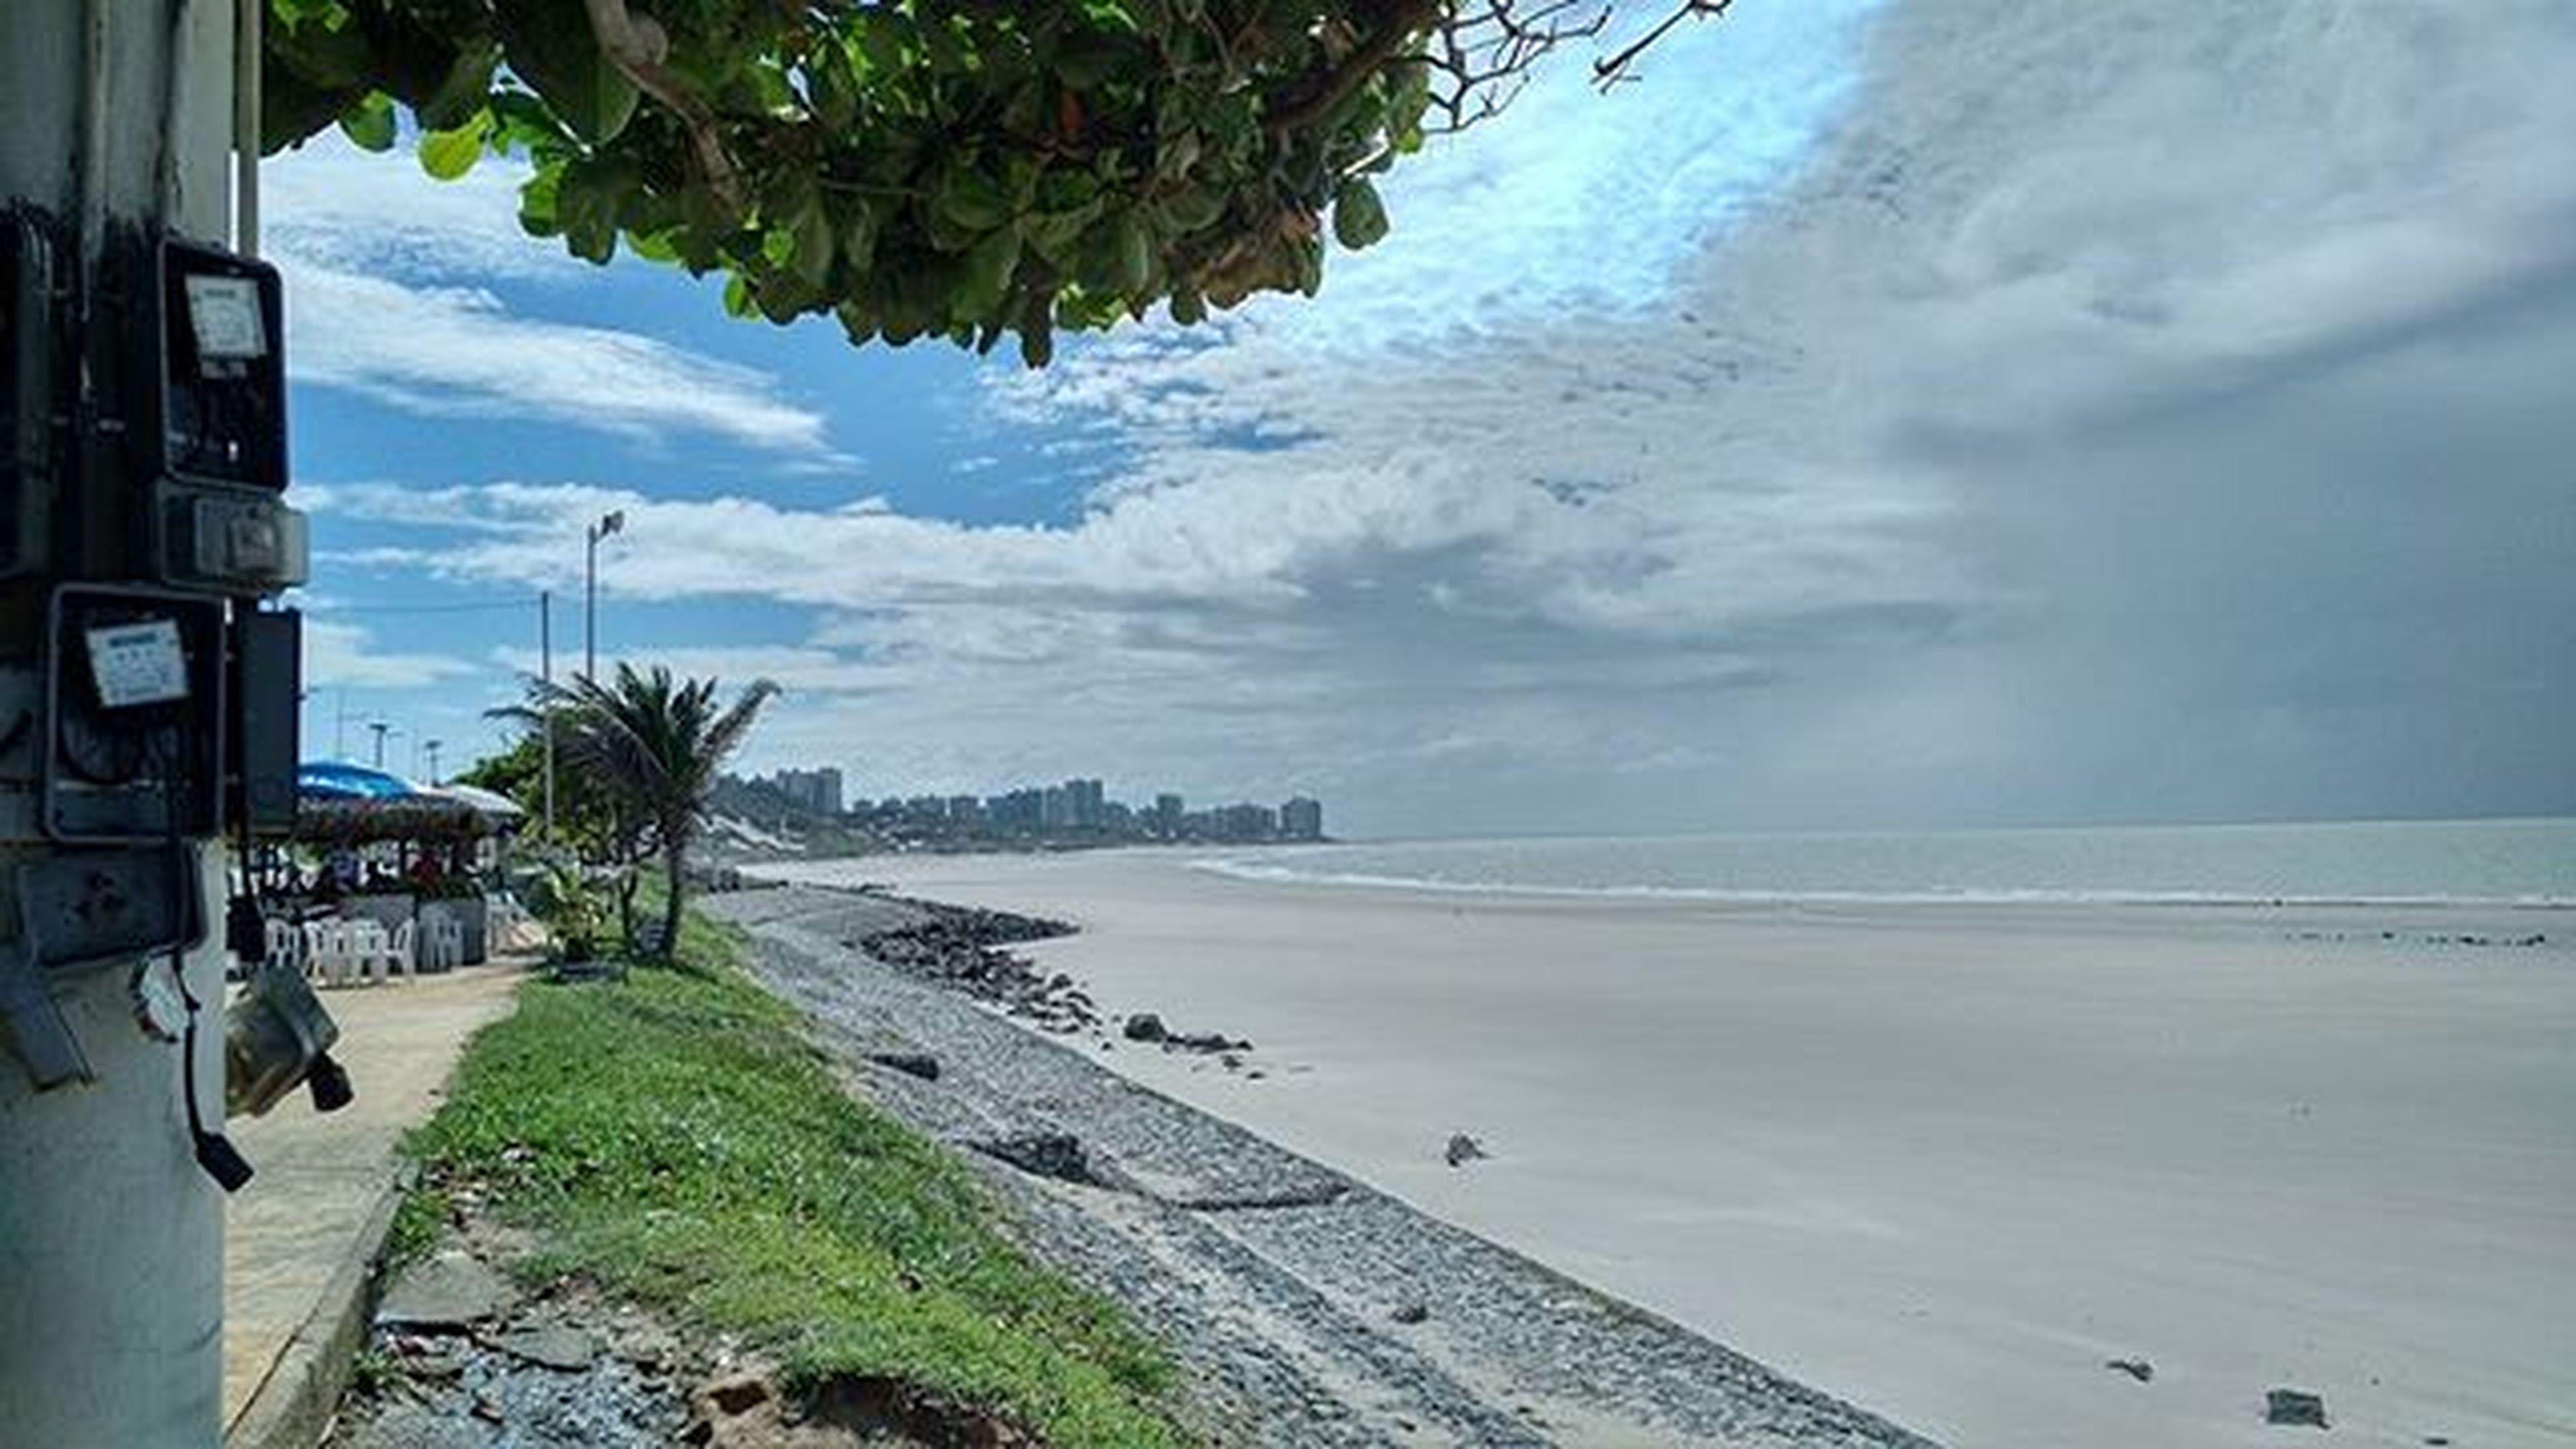 sea, beach, sky, water, tree, horizon over water, shore, palm tree, cloud - sky, sand, scenics, nature, tranquility, beauty in nature, tranquil scene, cloudy, cloud, coastline, incidental people, day